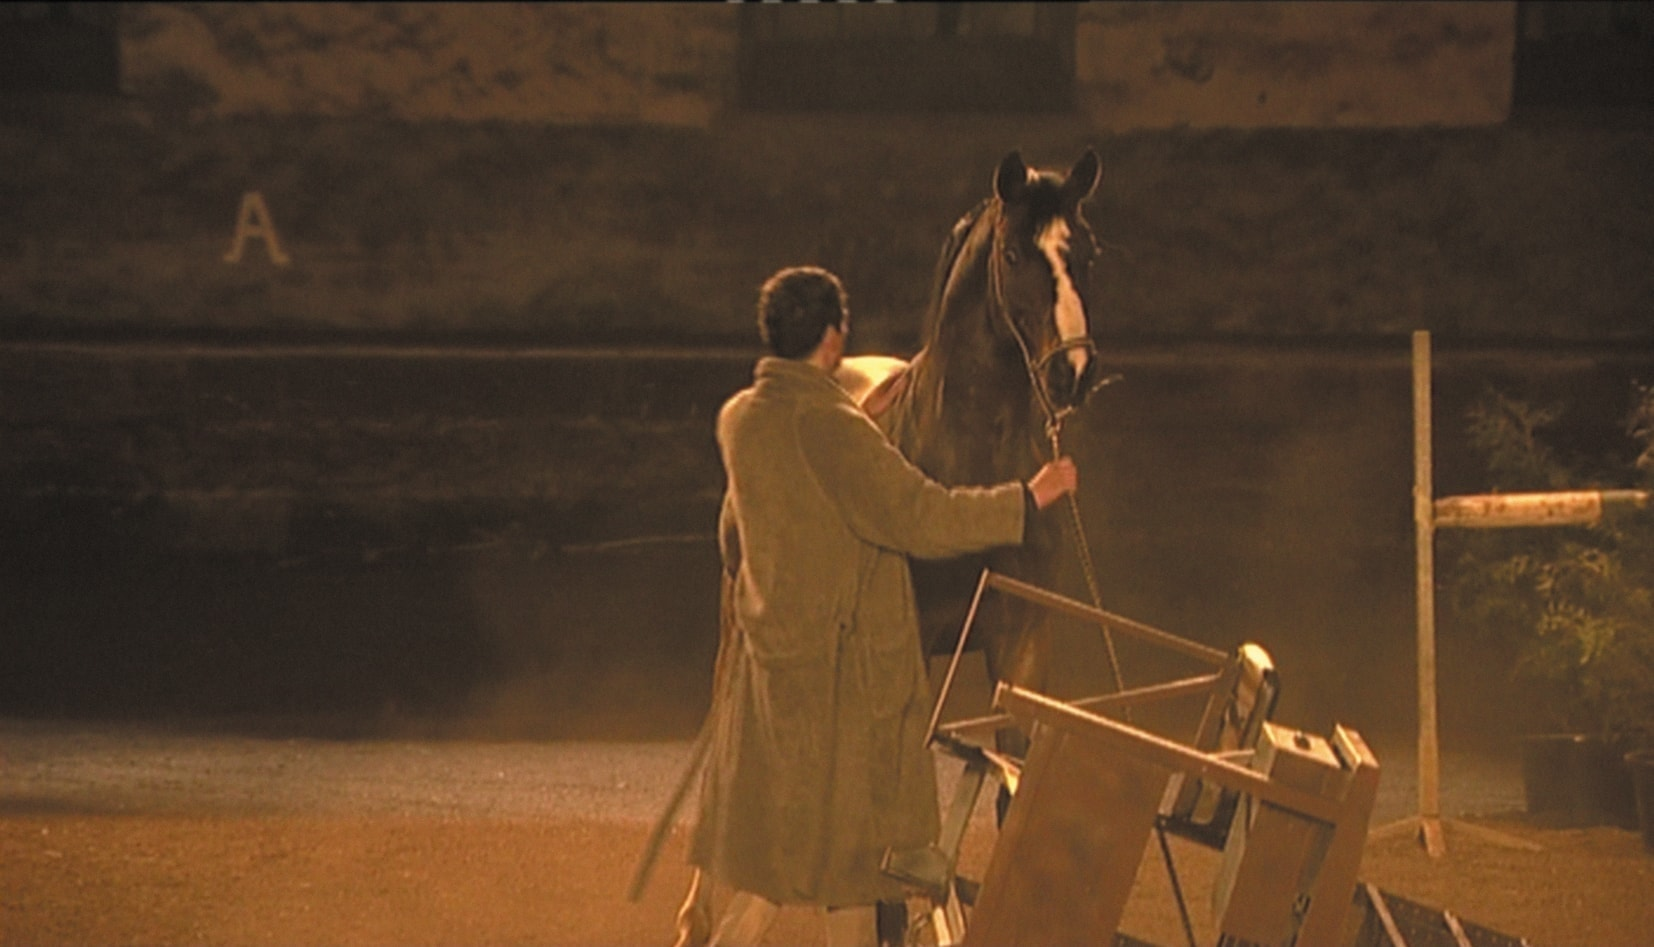 Le cheval rue dans Basse Normandie de Patricia Mazuy